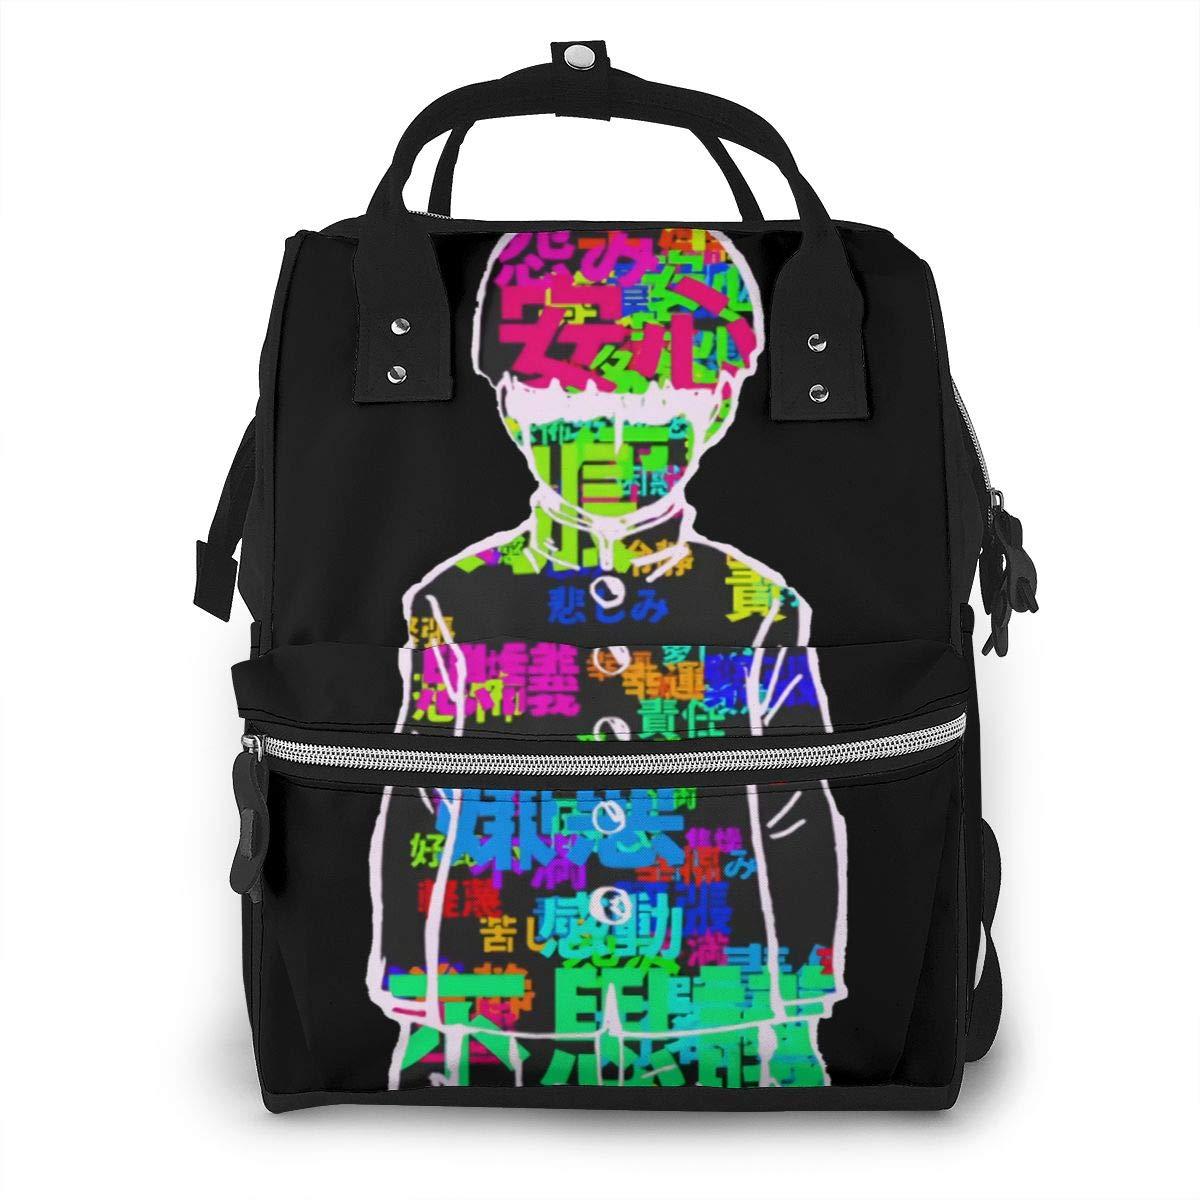 Mob Psycho 100 Shigeo Kageyama Diaper Bag Waterproof Travel Backpack Bags for Baby Care Mummy Backpack